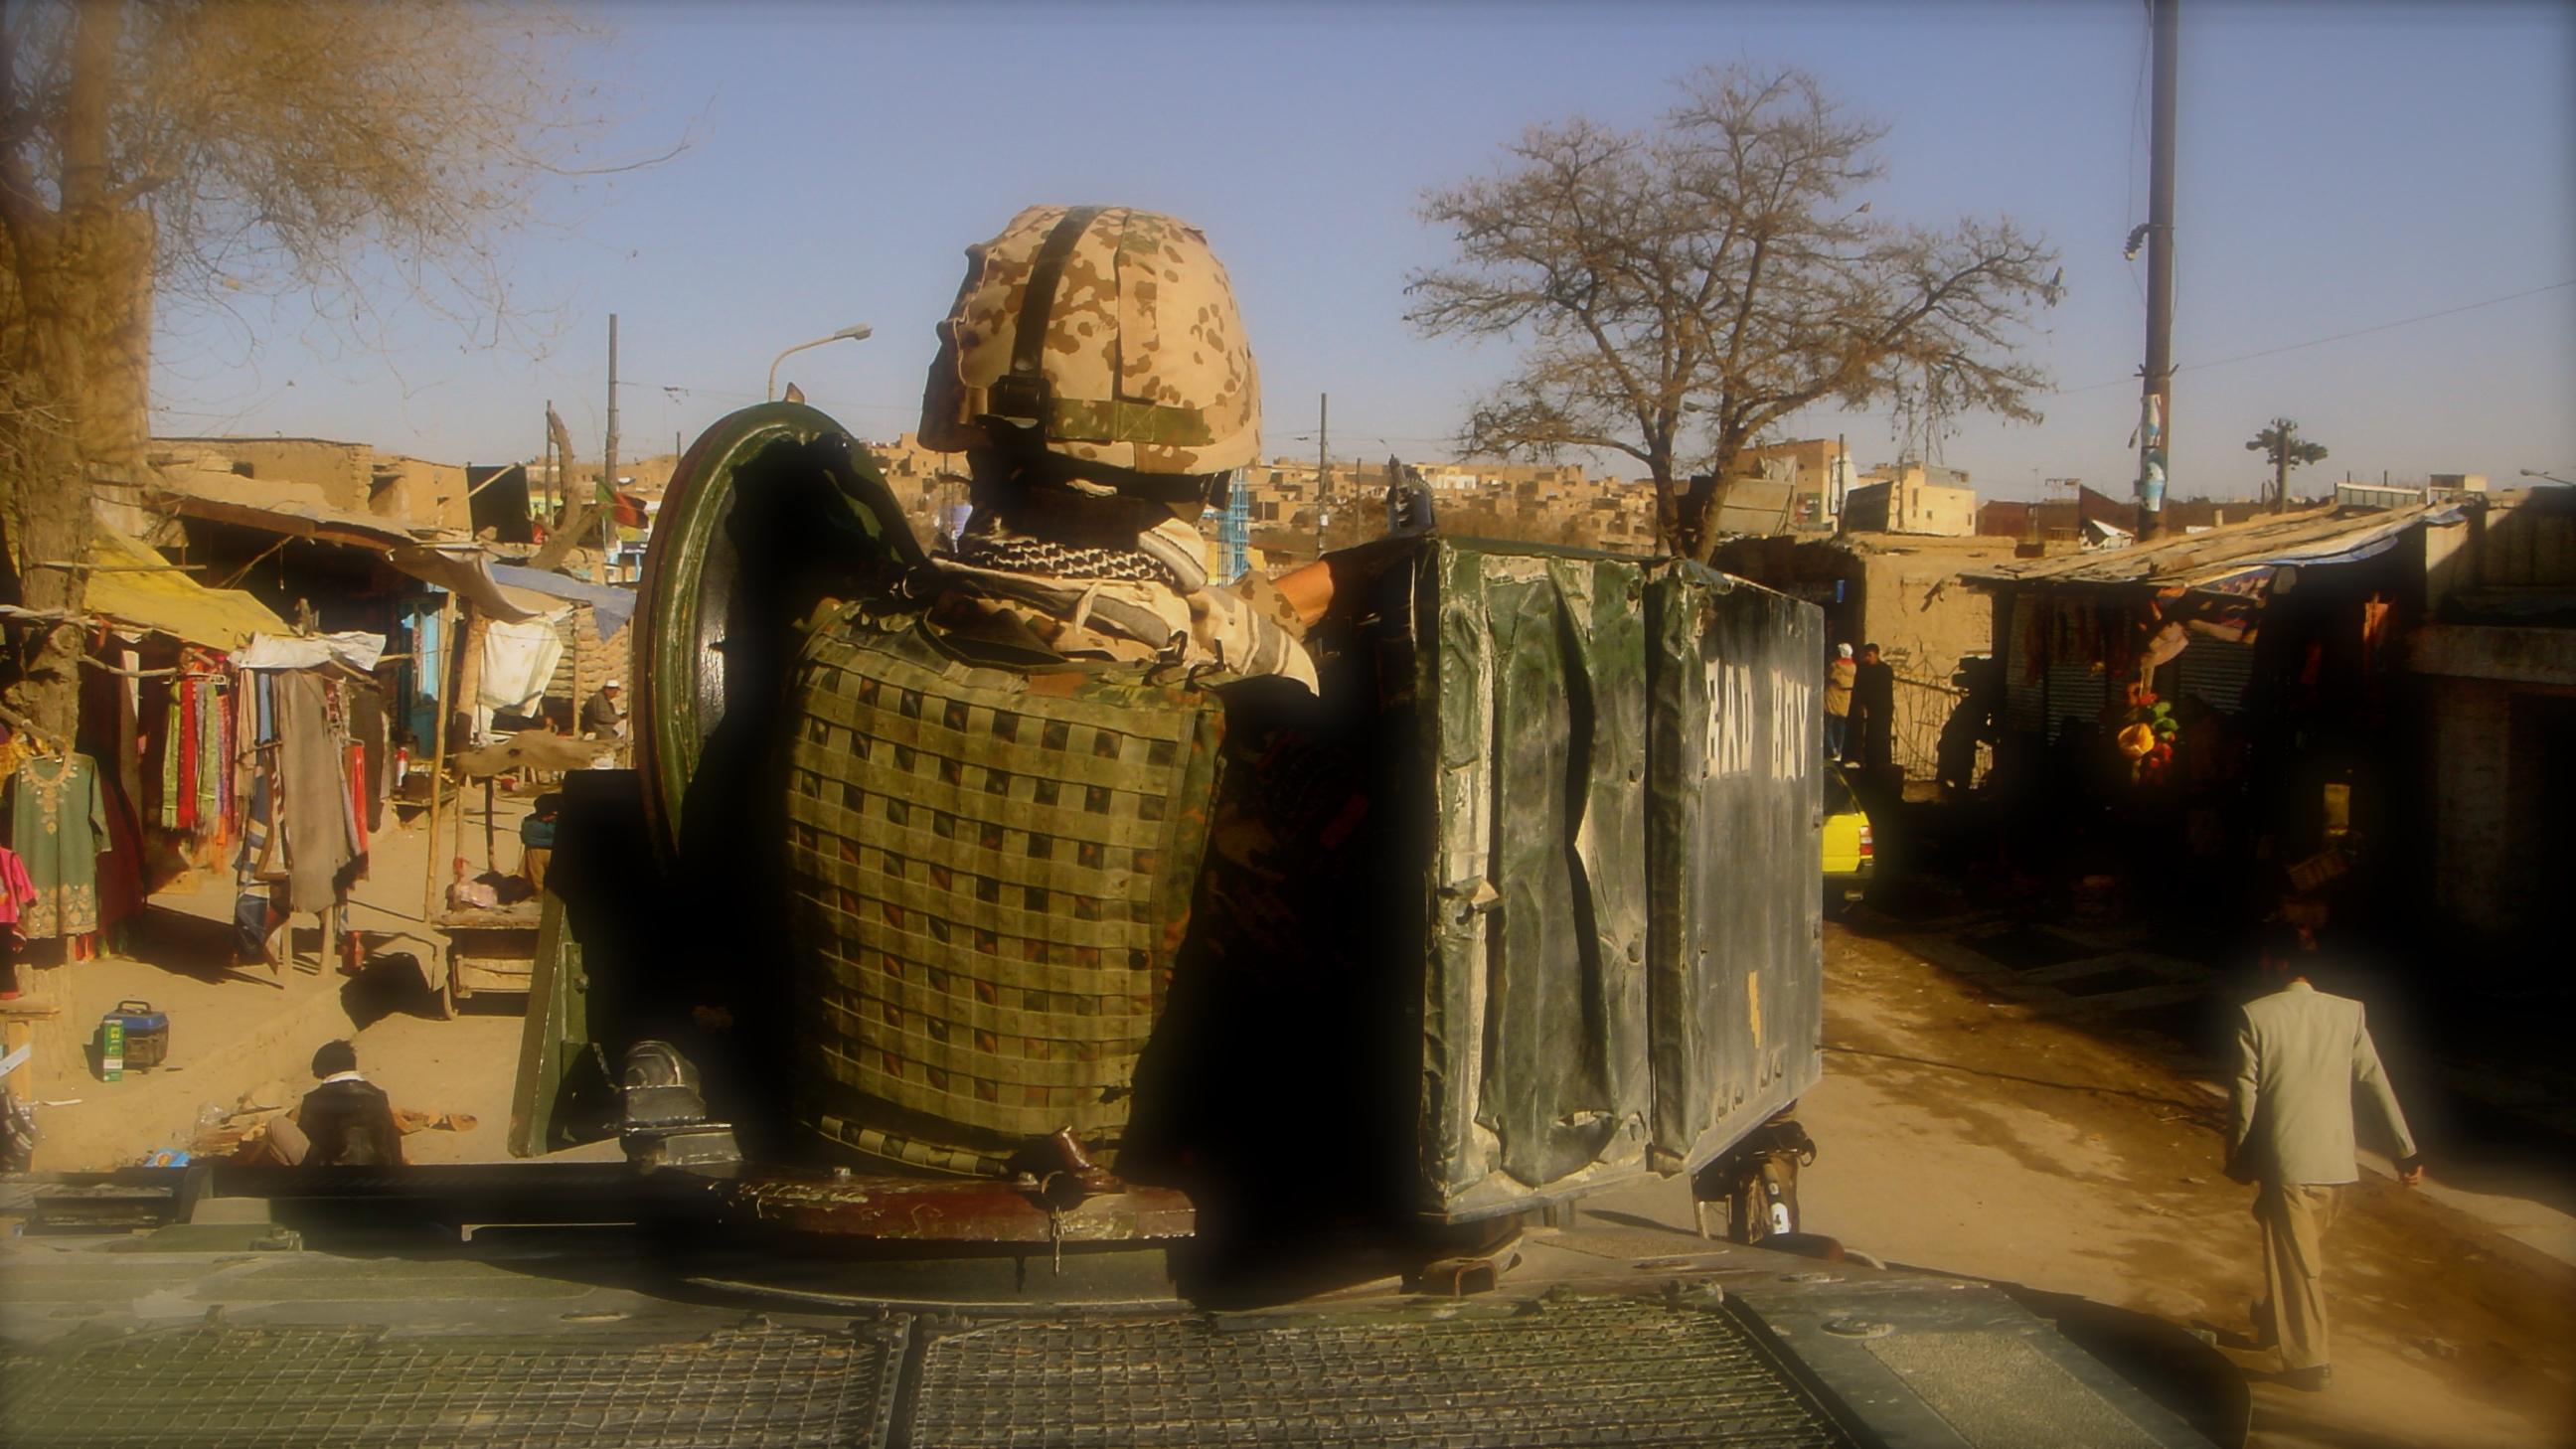 AfghanistanAPC.JPG